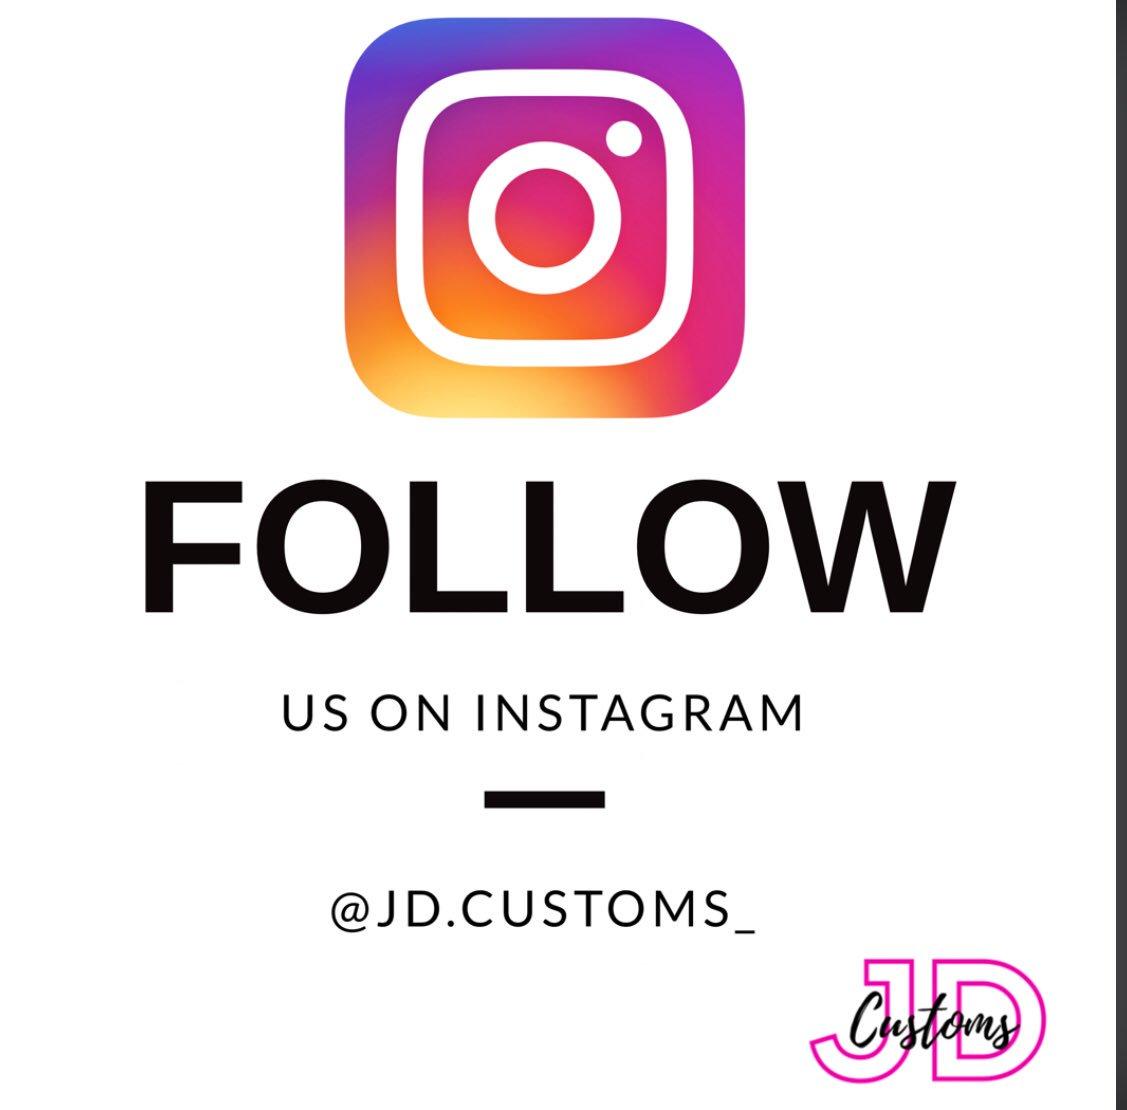 jdcustoms hashtag on Twitter